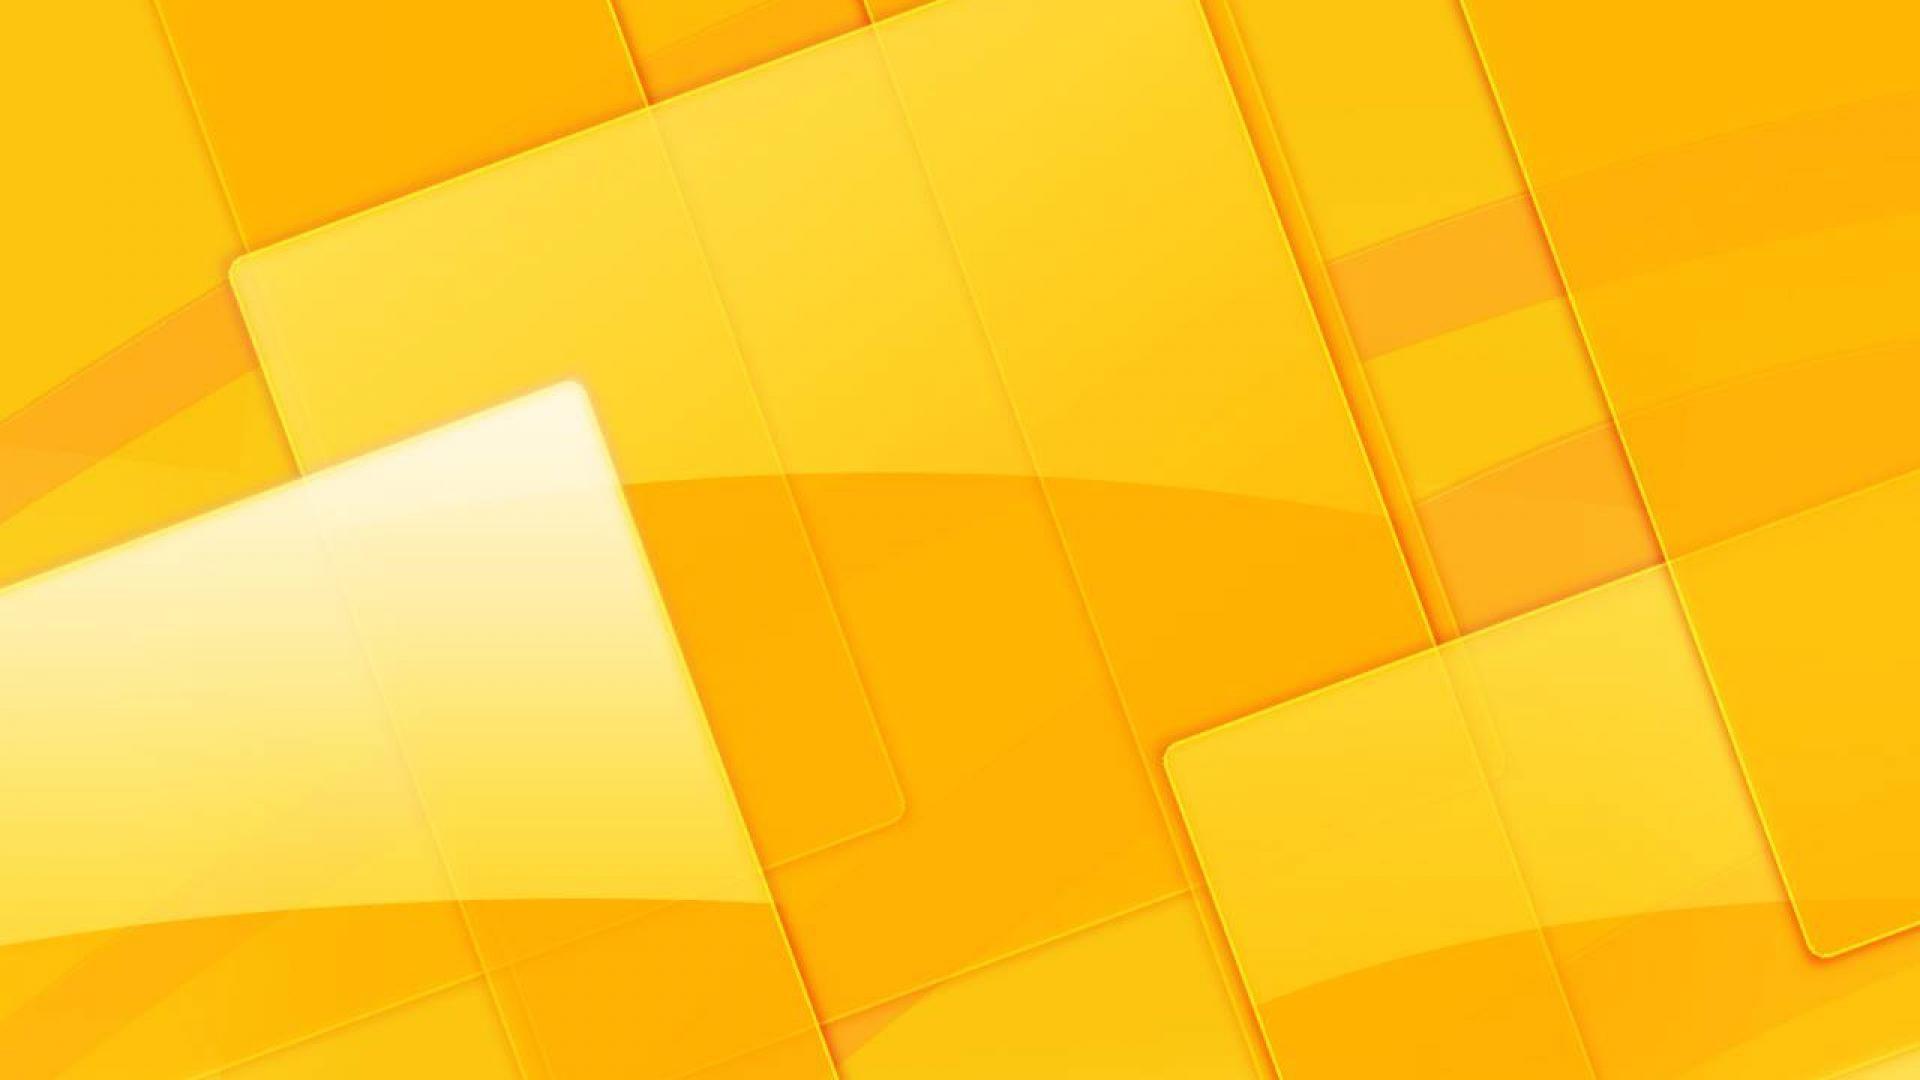 Yellow Design Wallpaper High Definition 183790 8174 Wallpaper Yellow Wallpaper Mustard Wallpaper High Resolution Wallpapers